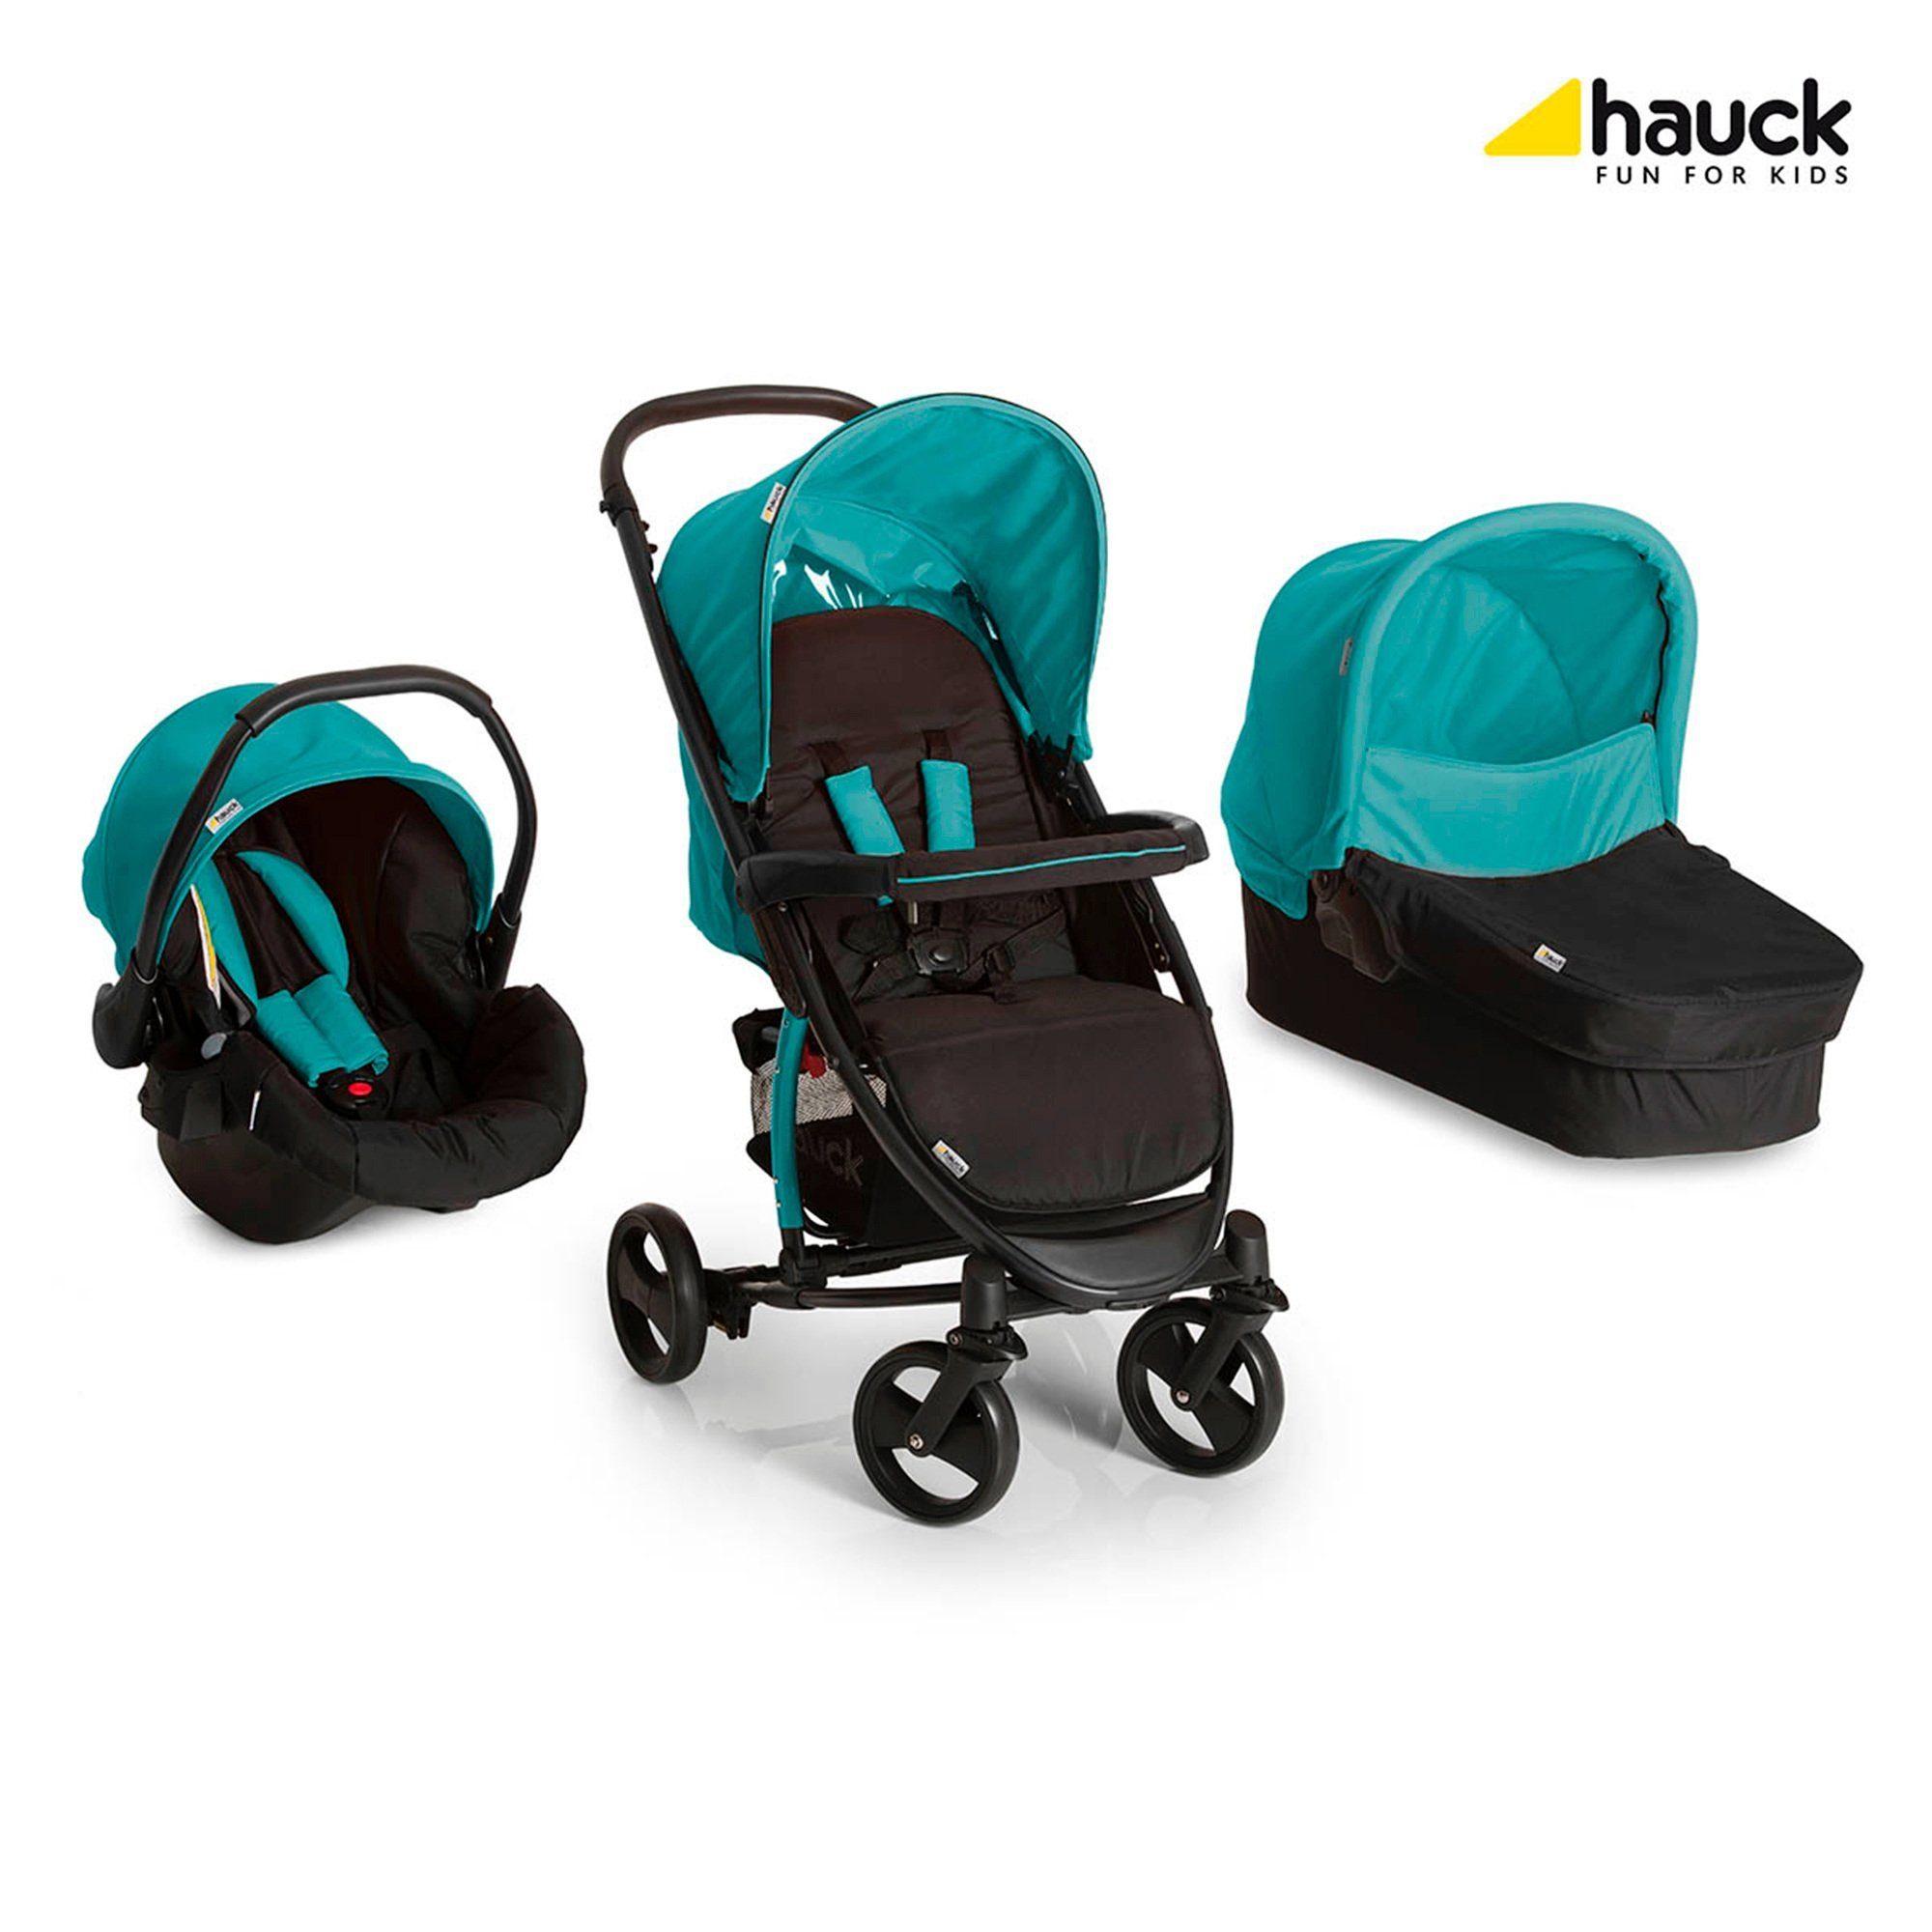 Hauck Miami 4 S Kombikinderwagen Trio-Set Design 2016